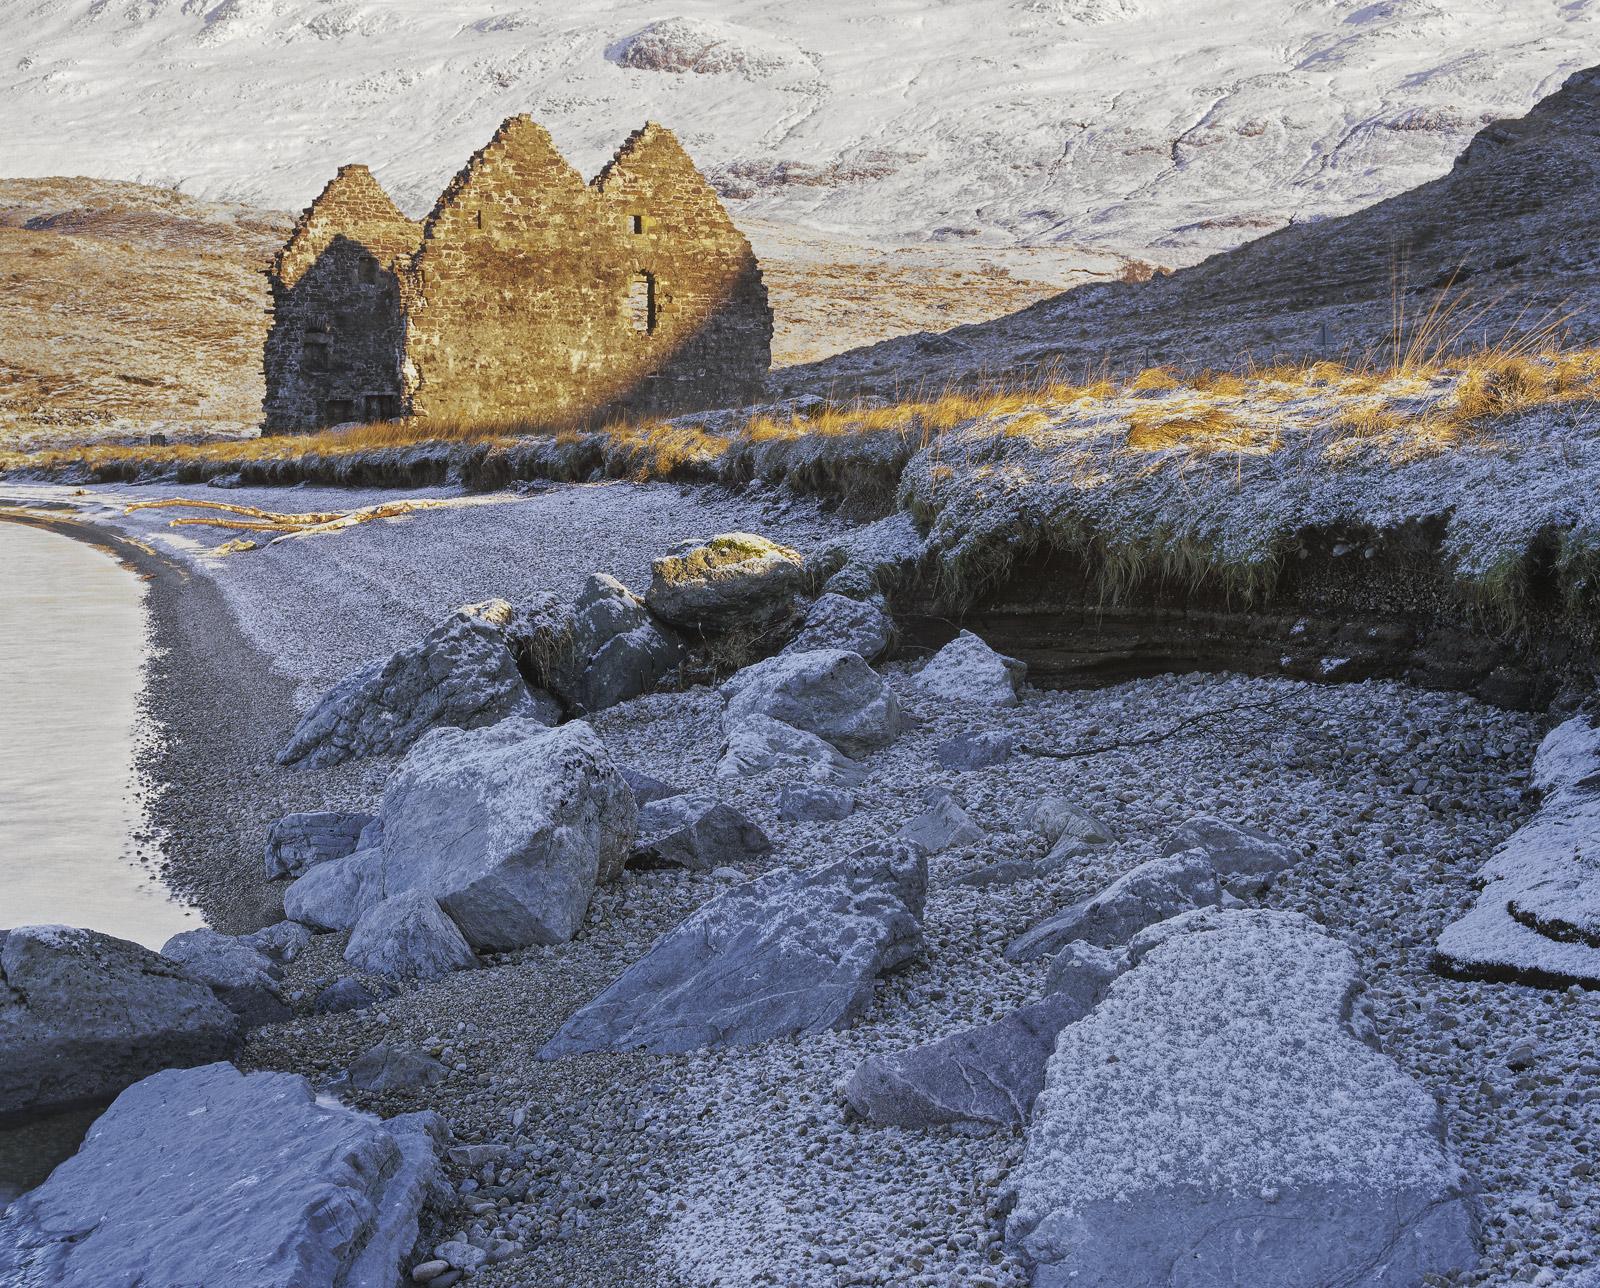 Frozen Ruin, Loch Assynt, Assynt, Scotland, derelict, ruin, castle, history, winter, shingle, bay, rime, blue, building, photo